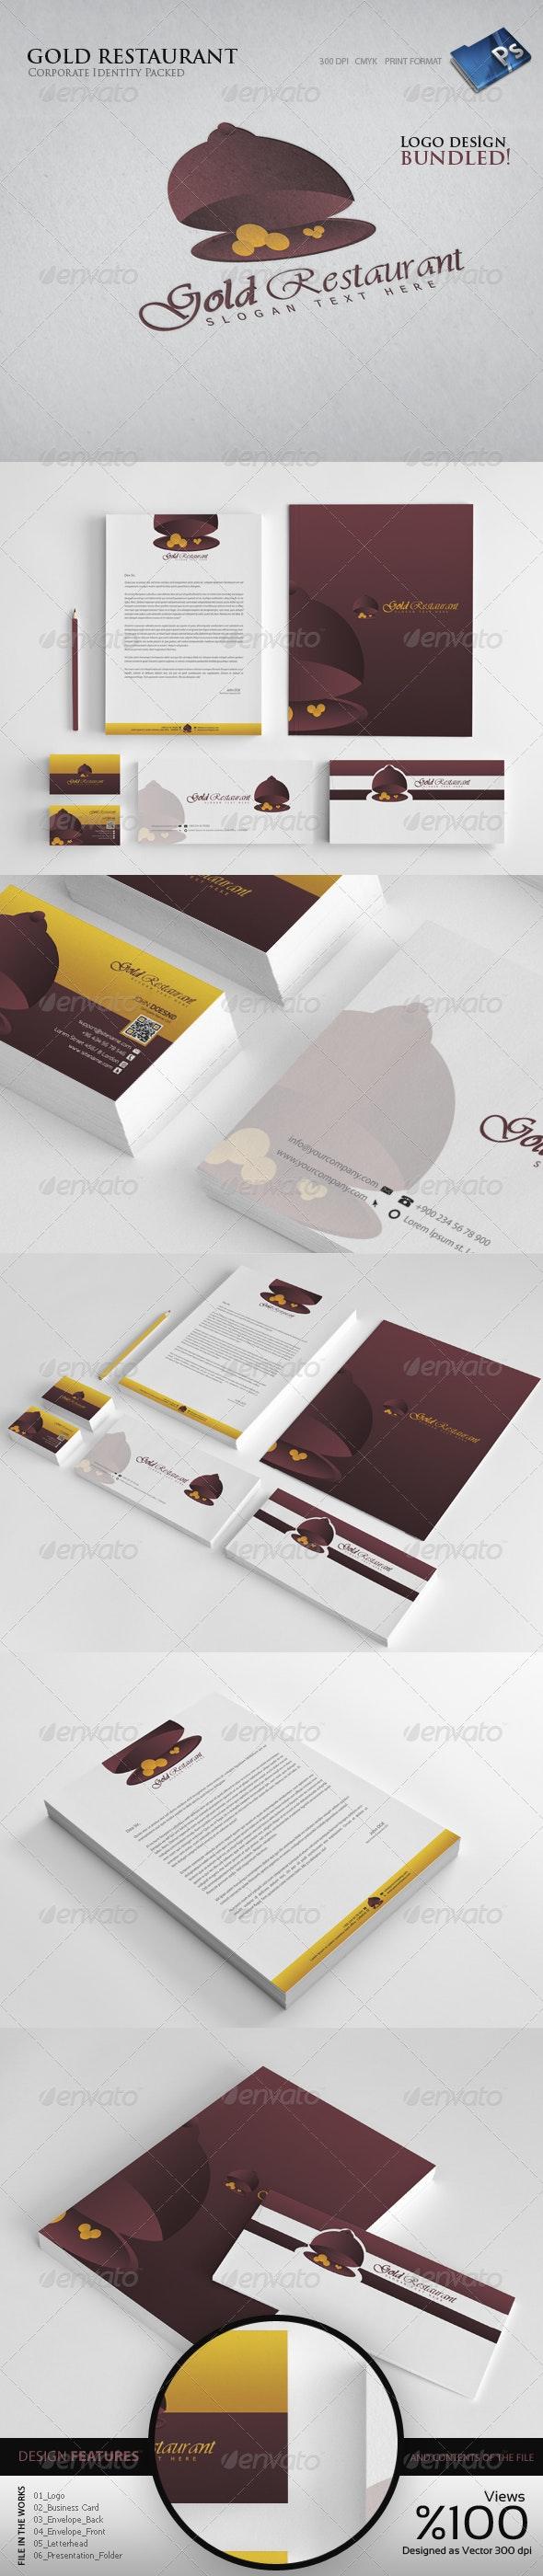 Gold Reustrant  - Corporate Identity - Stationery Print Templates